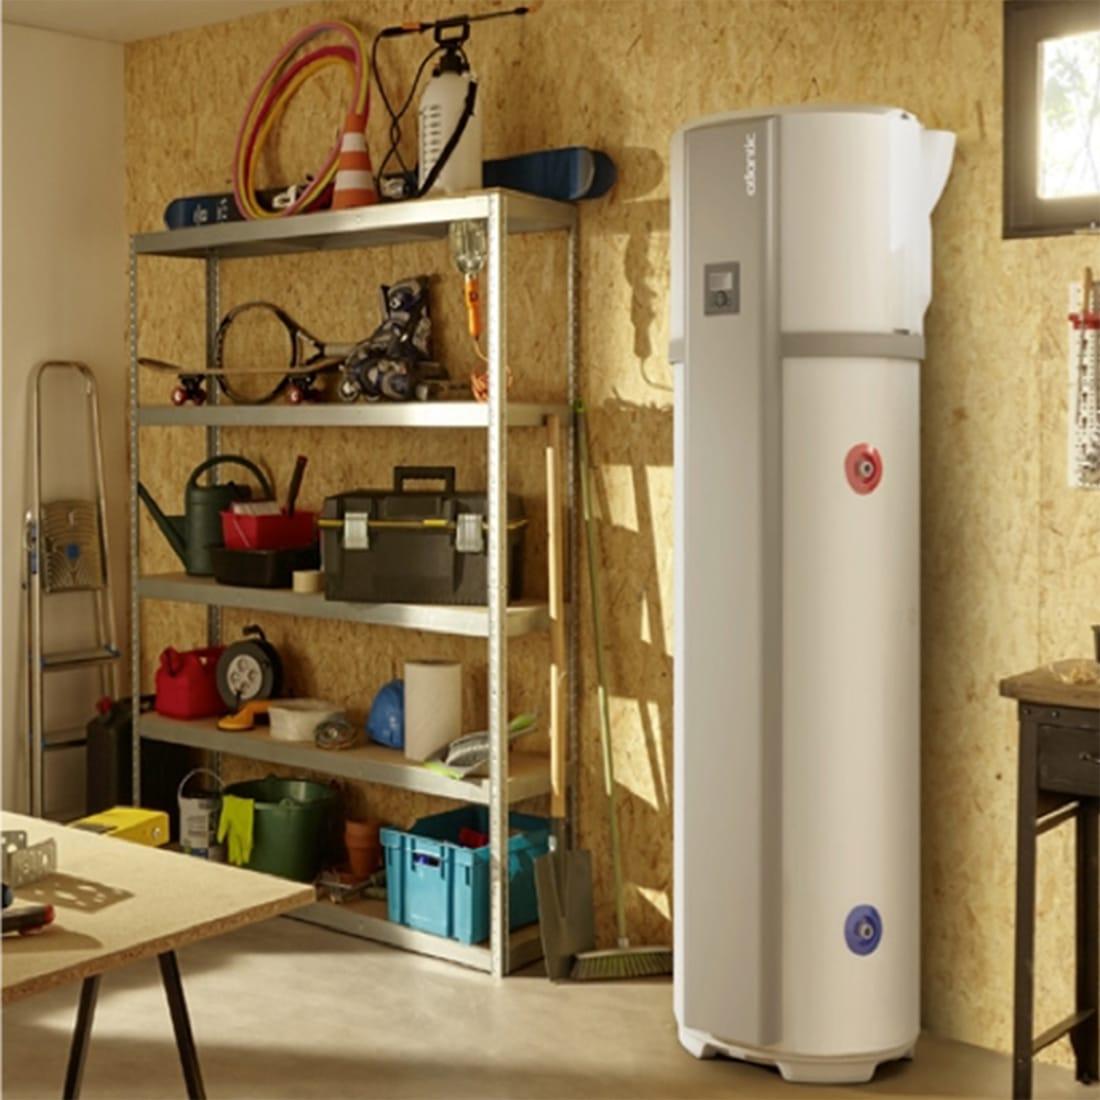 neovivo-vente-installation-chauffe-eau-thermodynamique-PAC-atlantic